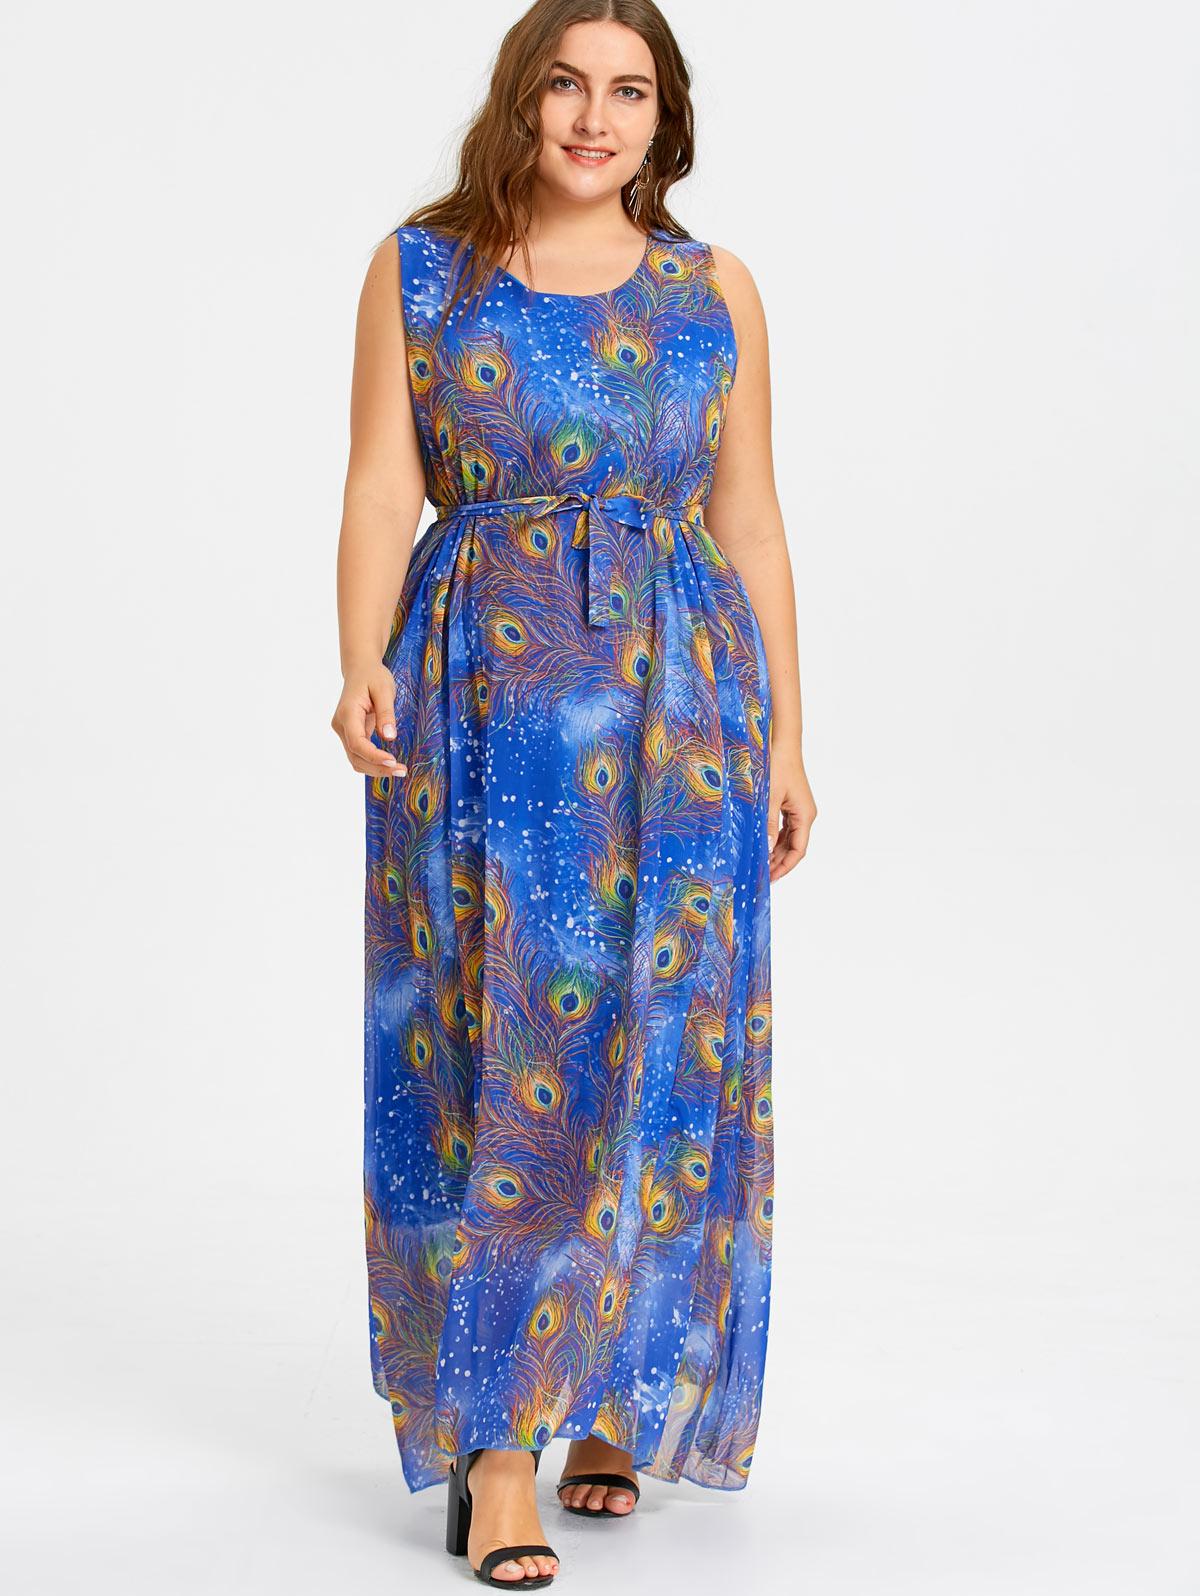 Gamiss Plus Size Peacock Feather Print Maxi Chiffon Dress